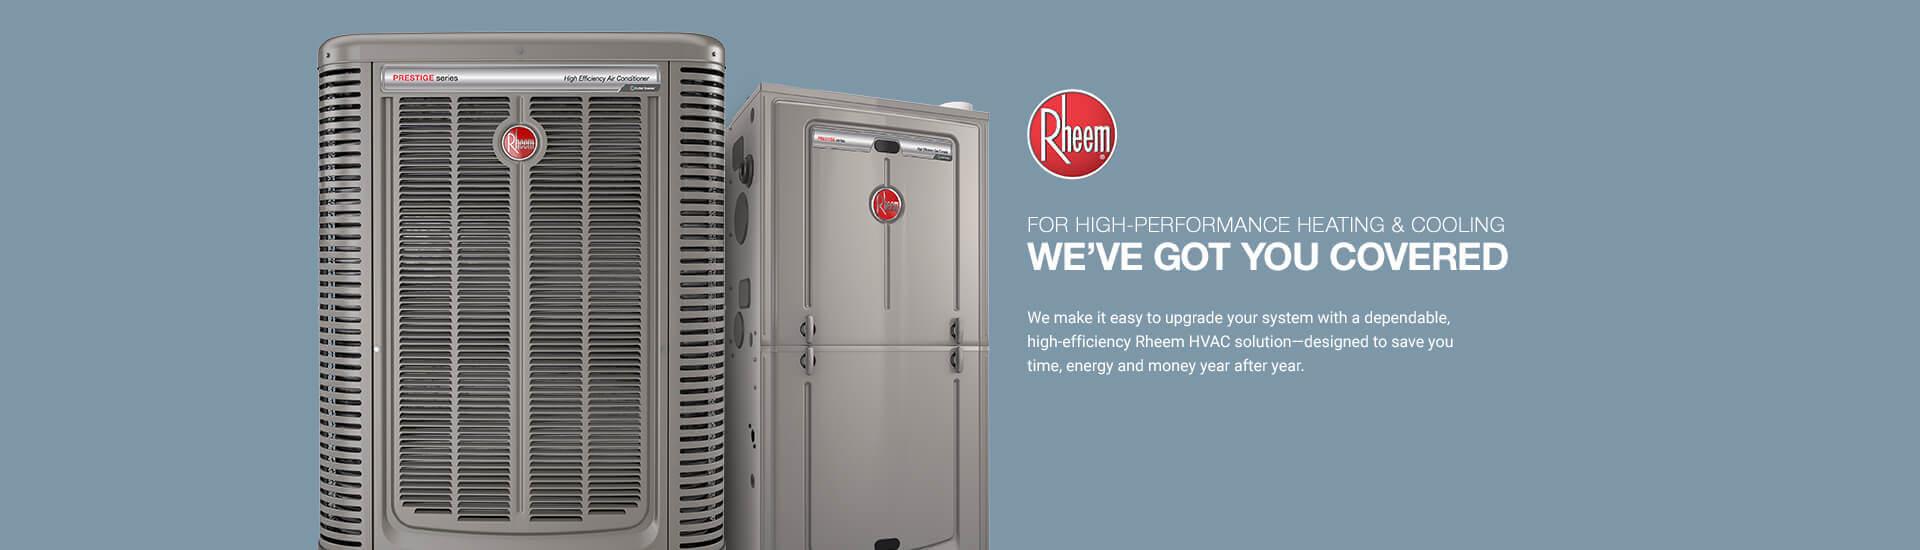 Rheem HVAC Contractor